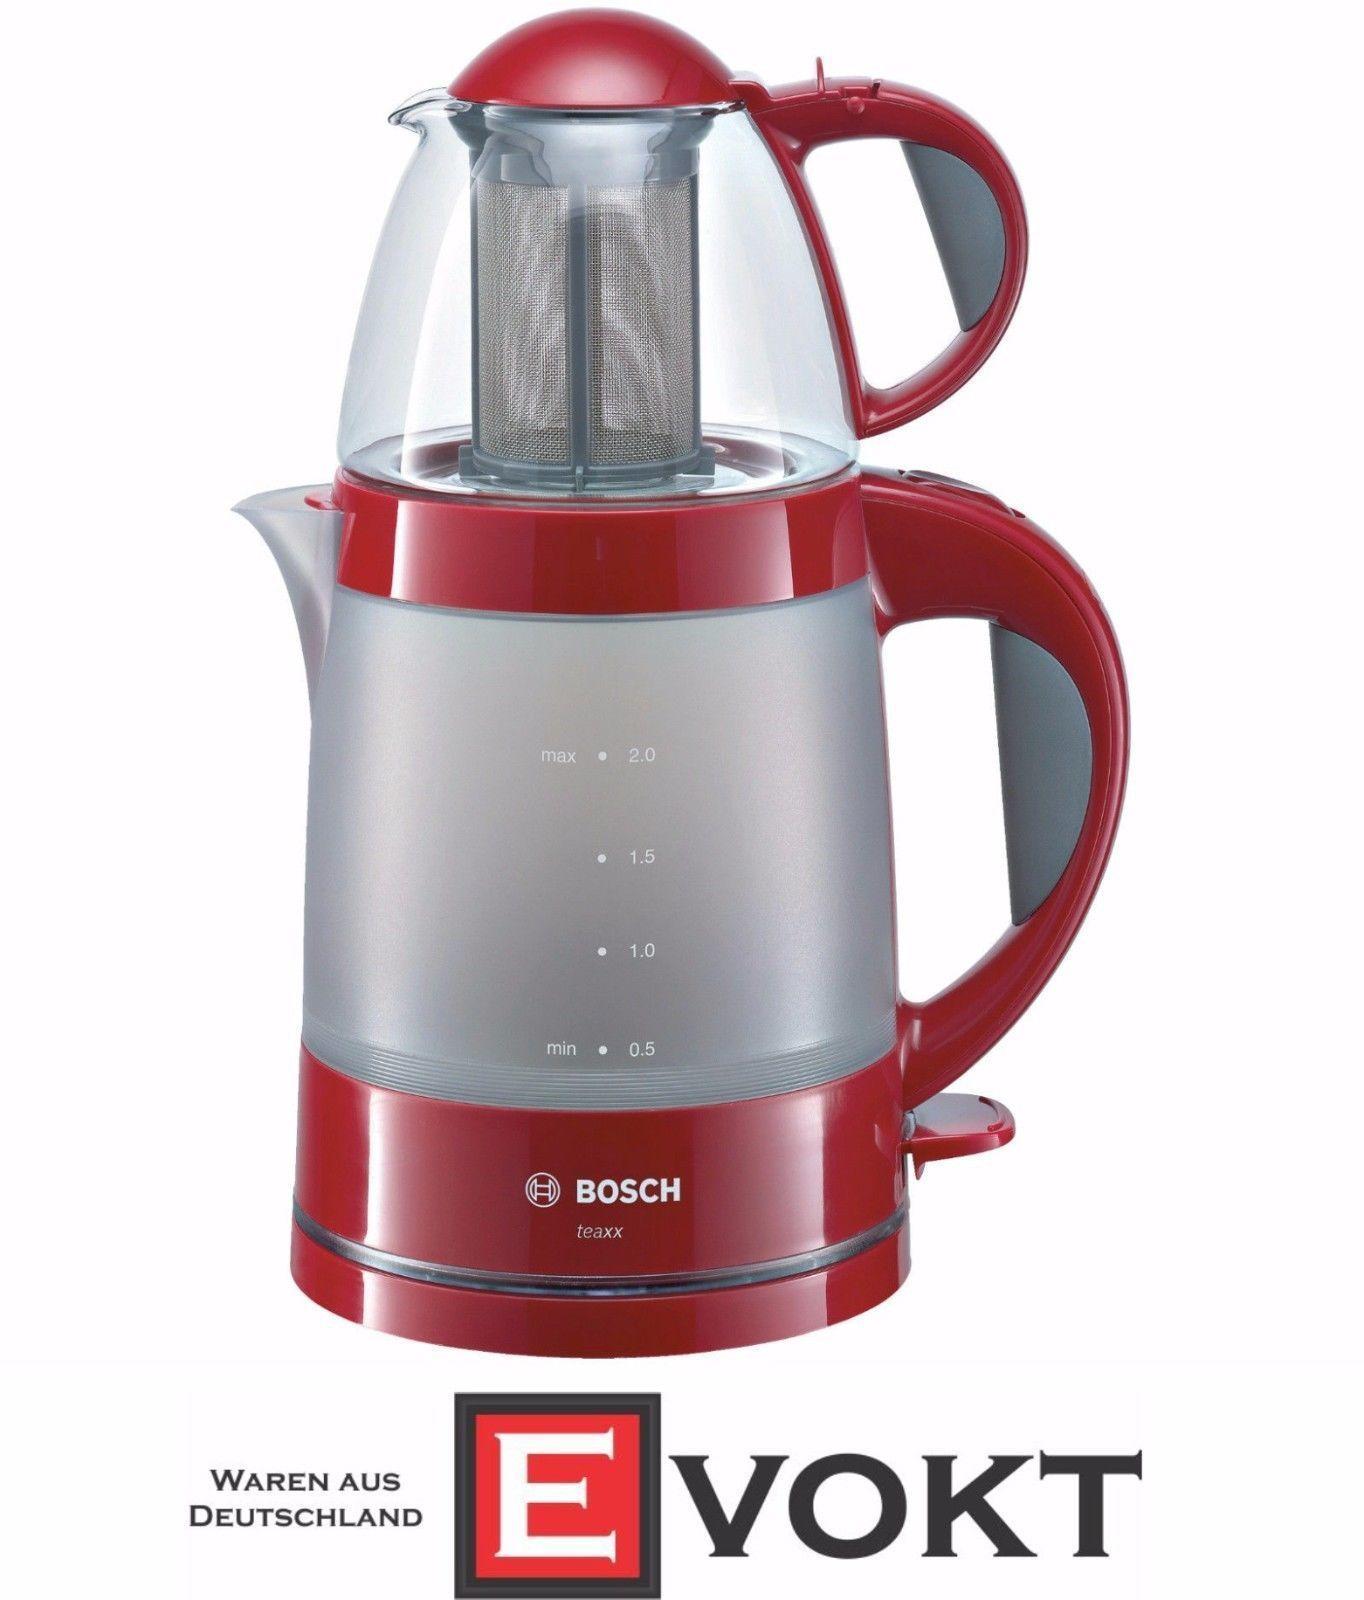 Bosch Teaxx TTA2010 Tea Maker Red Teapot 1785W Keep Warm Function GENUINE NEW